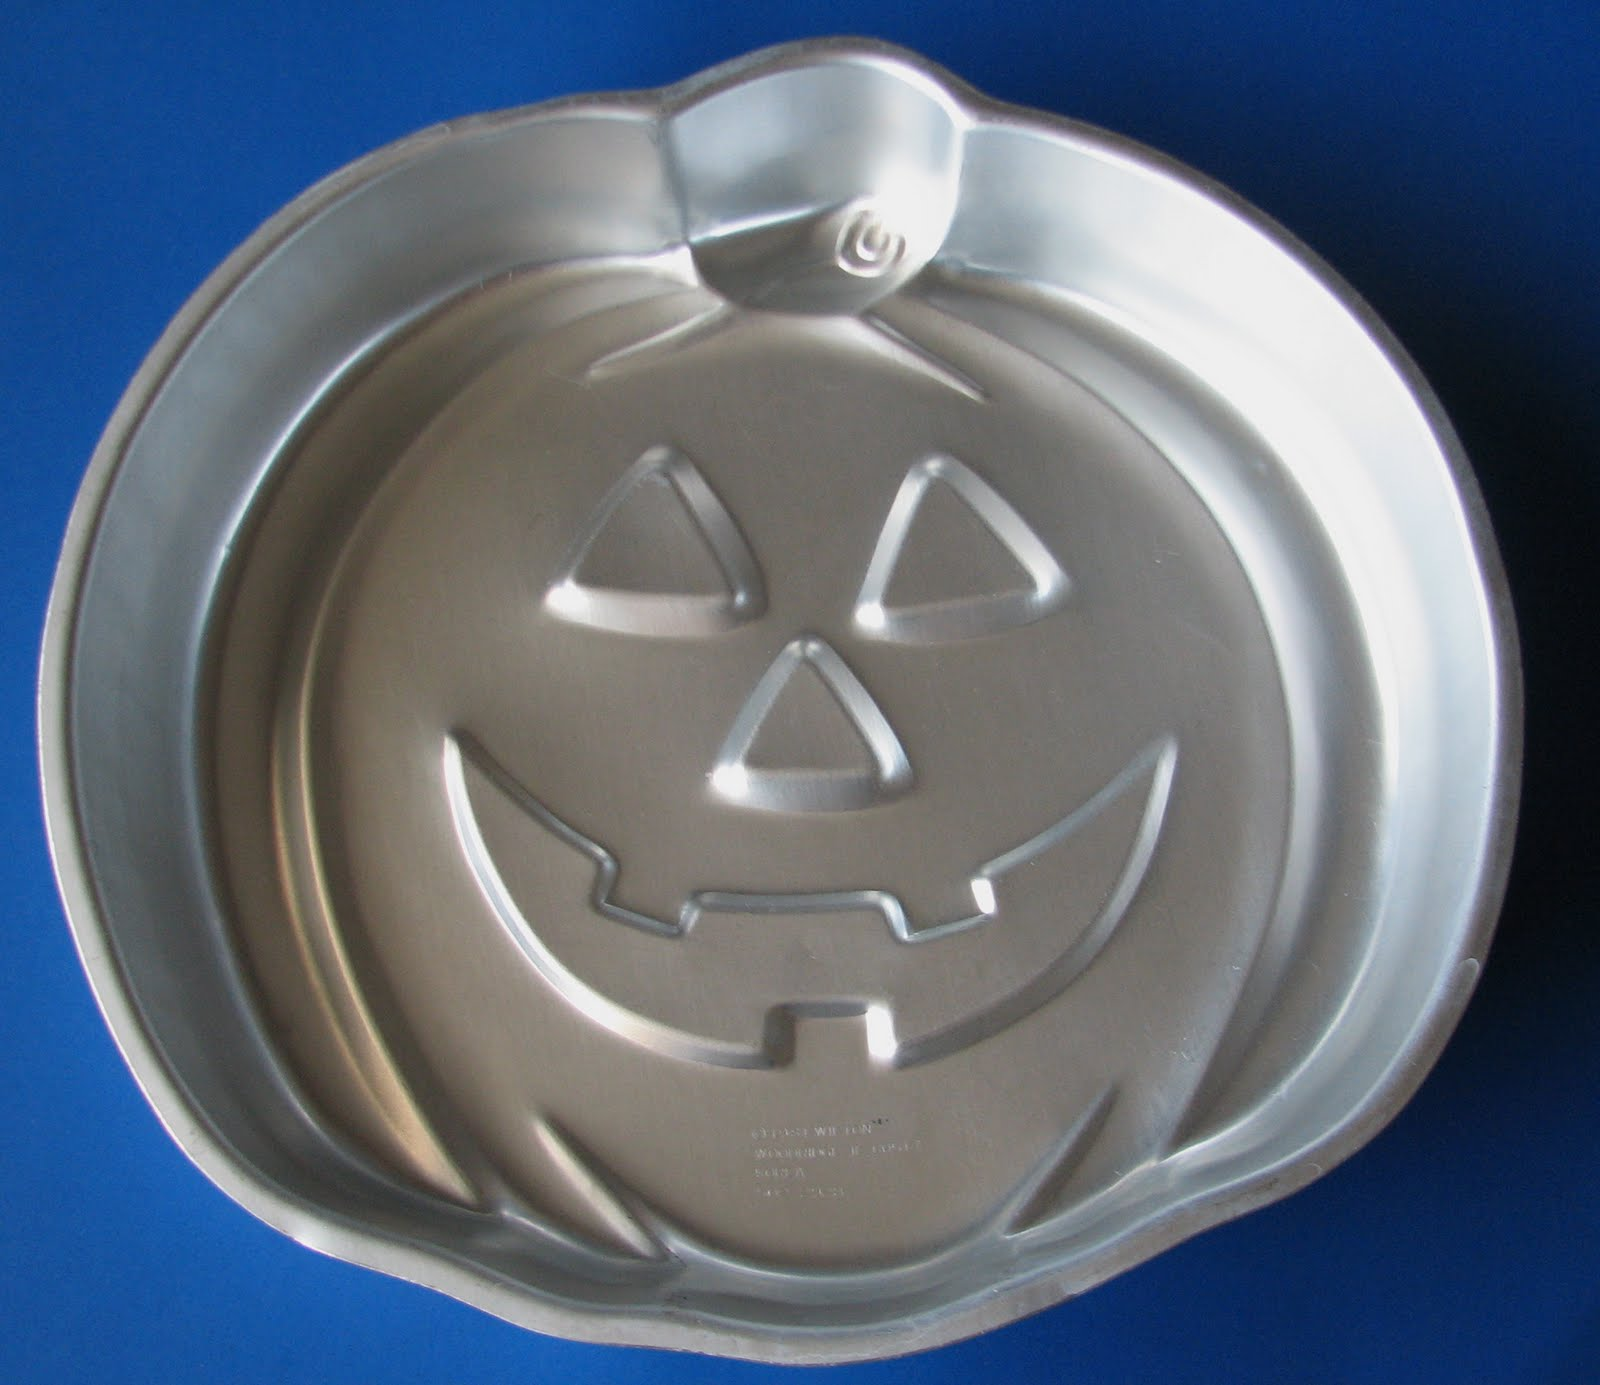 Skull Cake Baking Pan - The Green Head  |Halloween Baking Pans